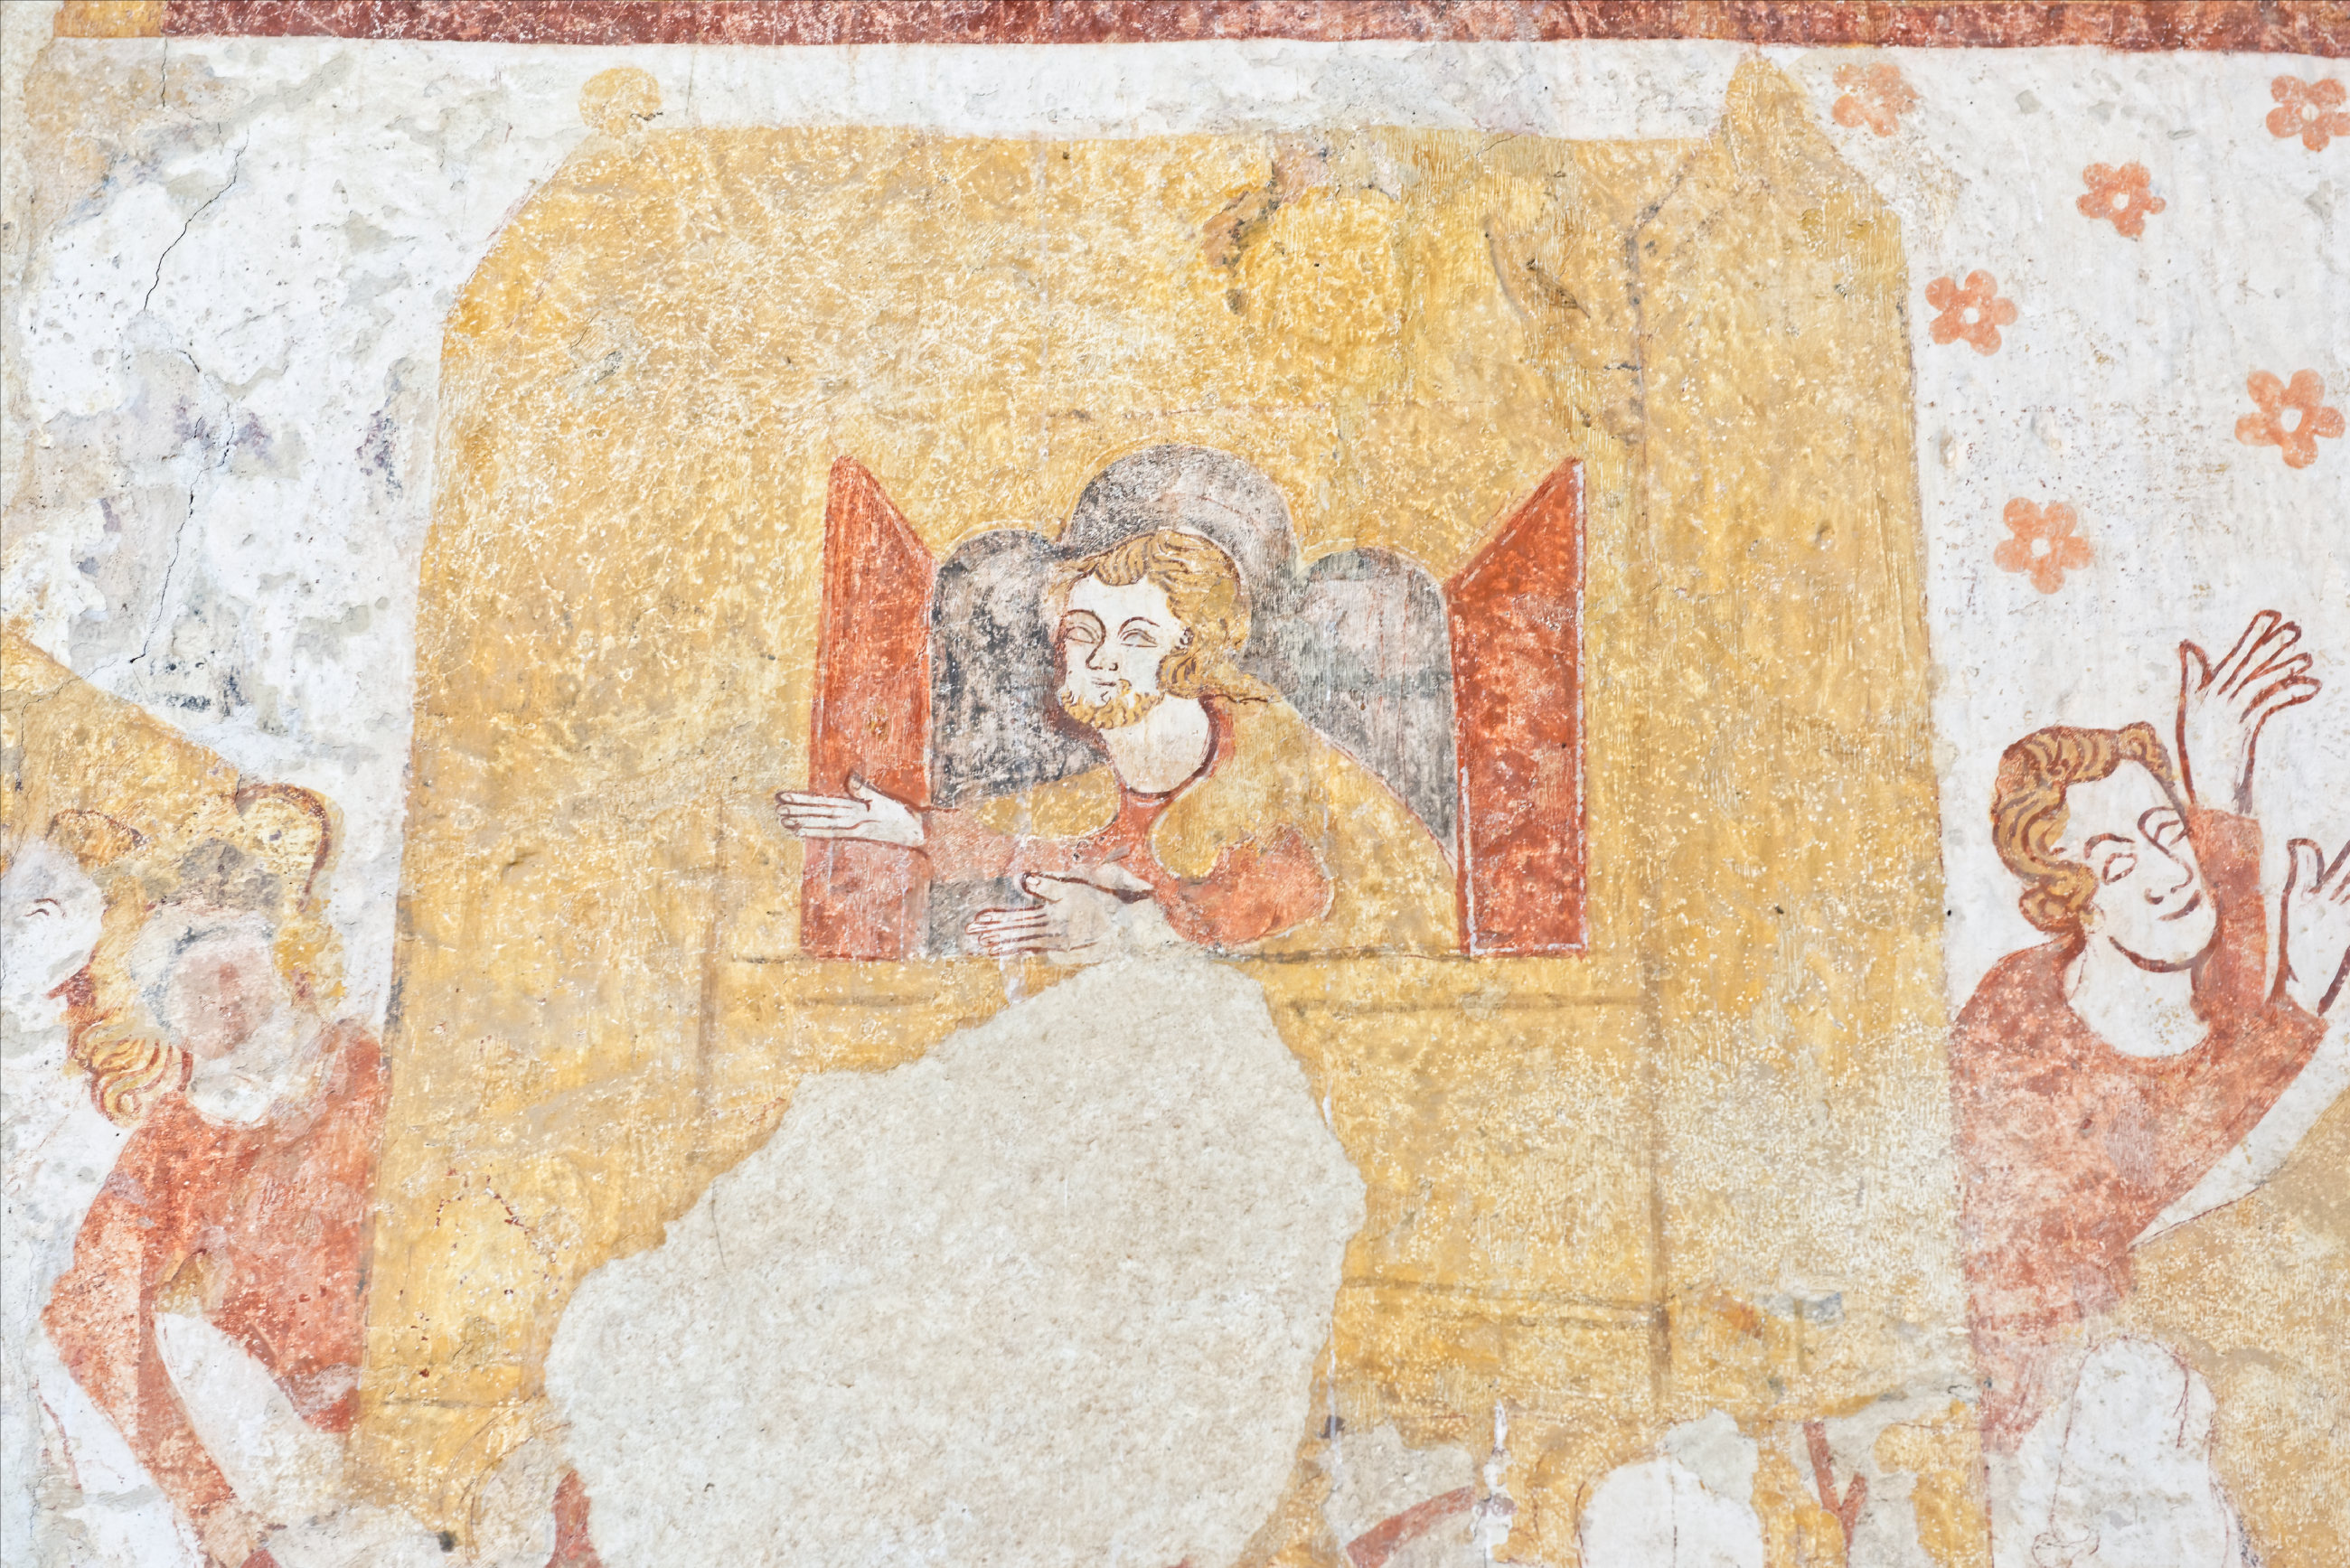 150405-Moutiers en Puisaye (35)